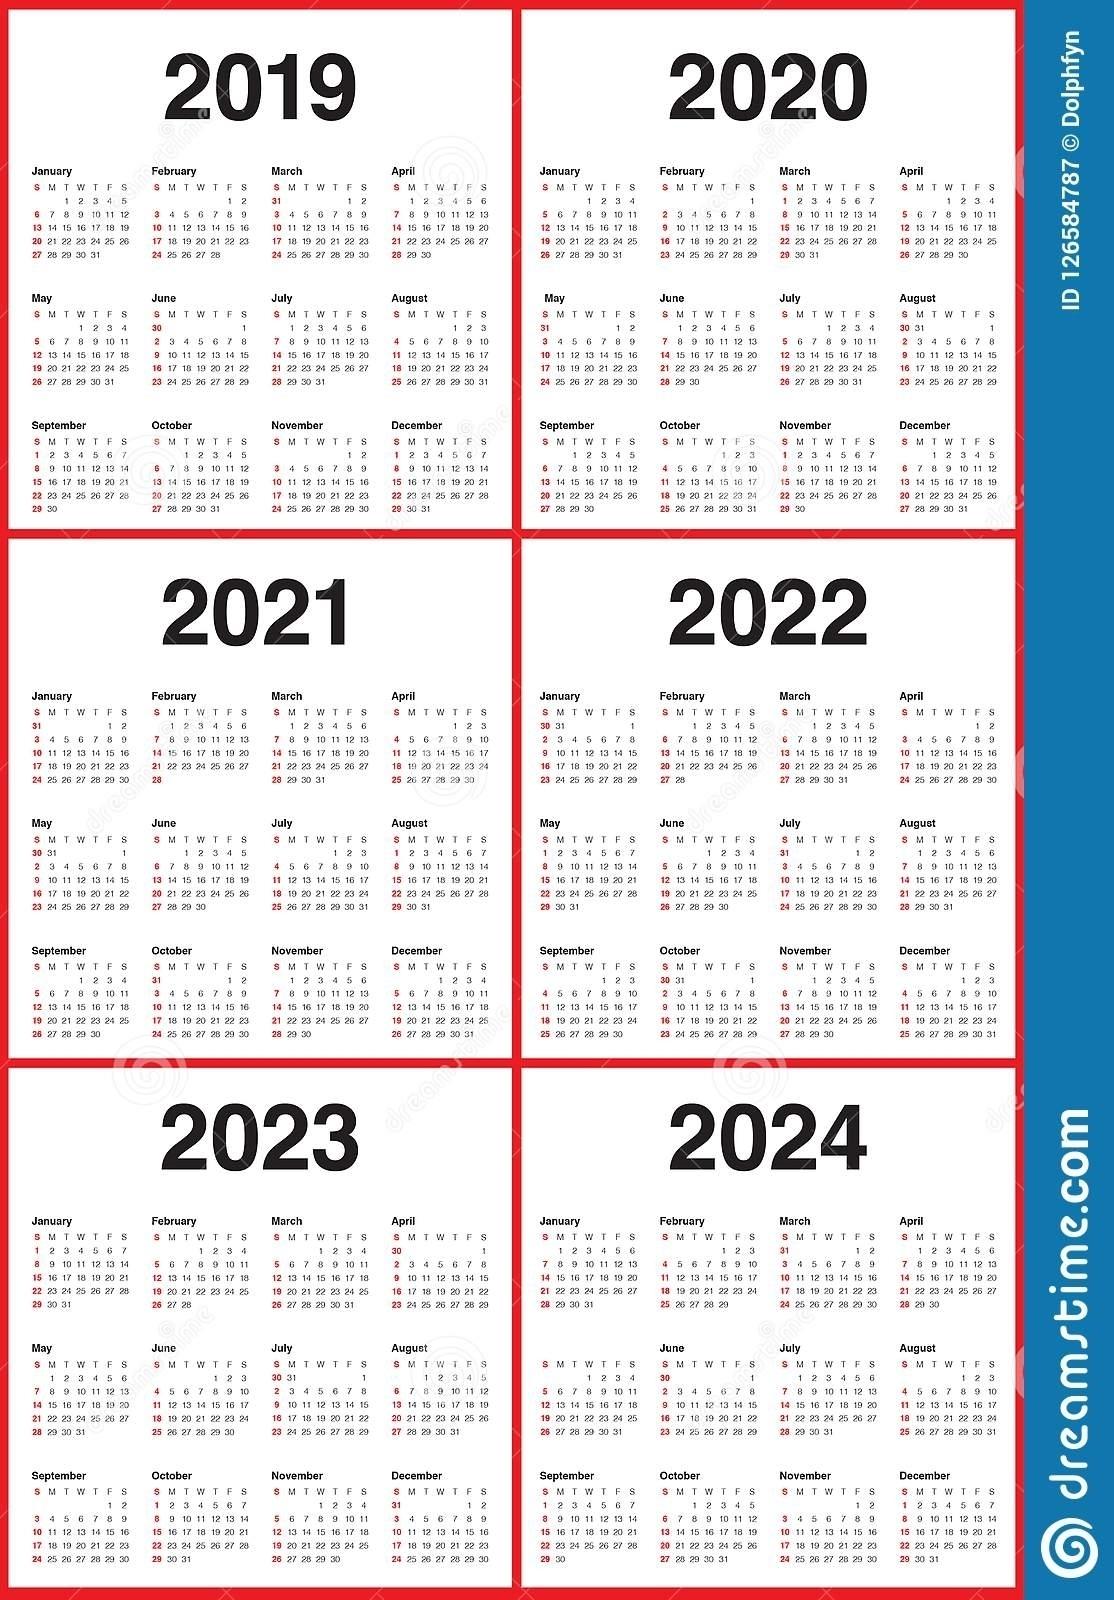 Printable Calendar 2020 2021 2022 2023 - Calendar ...